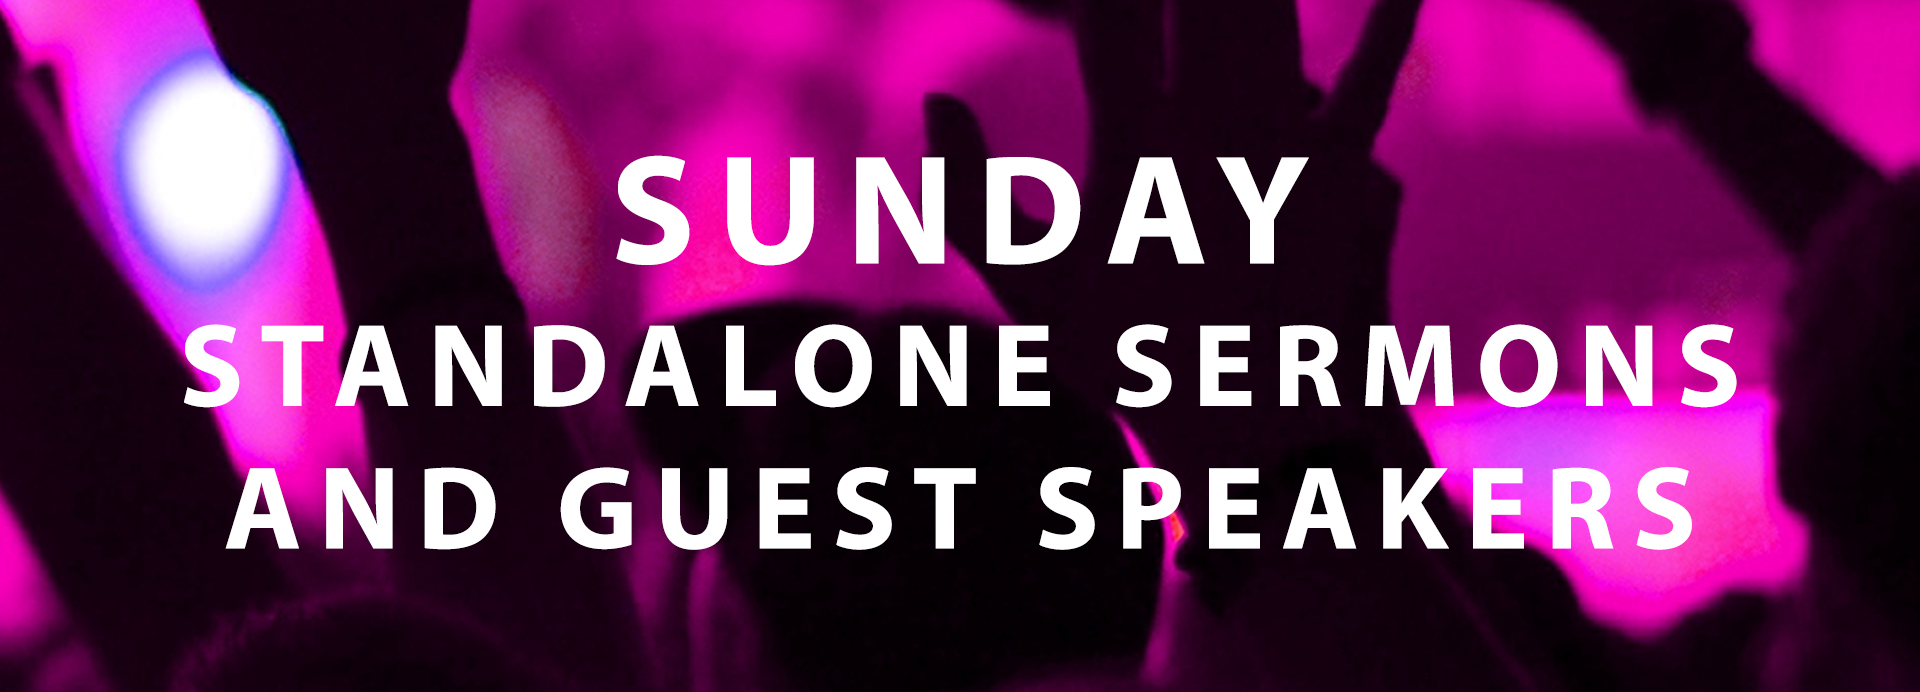 Sunday Standalone Sermons banner.jpg